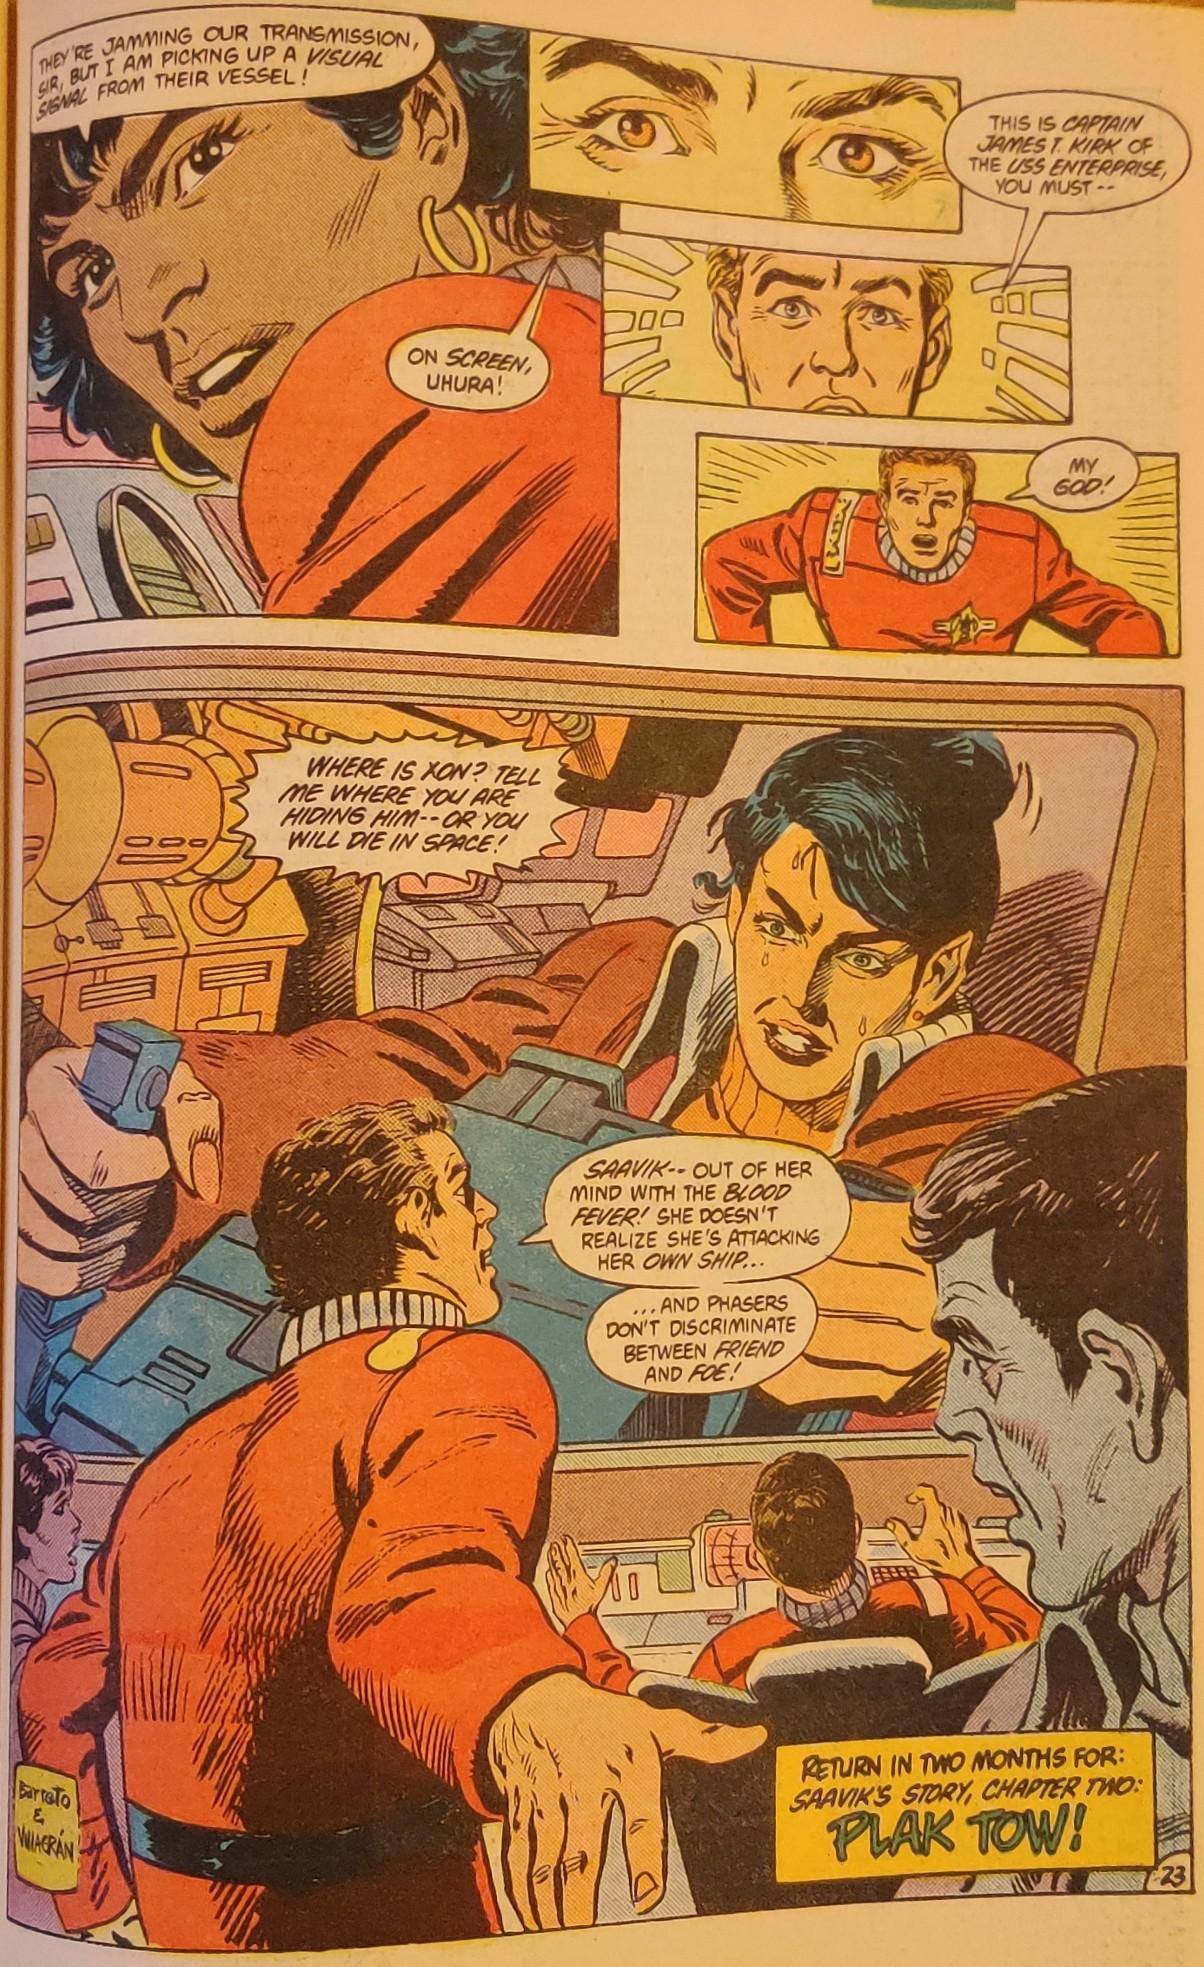 DC Comics Star Trek Issue 6 - Thirsty Saavik Rage Phasers